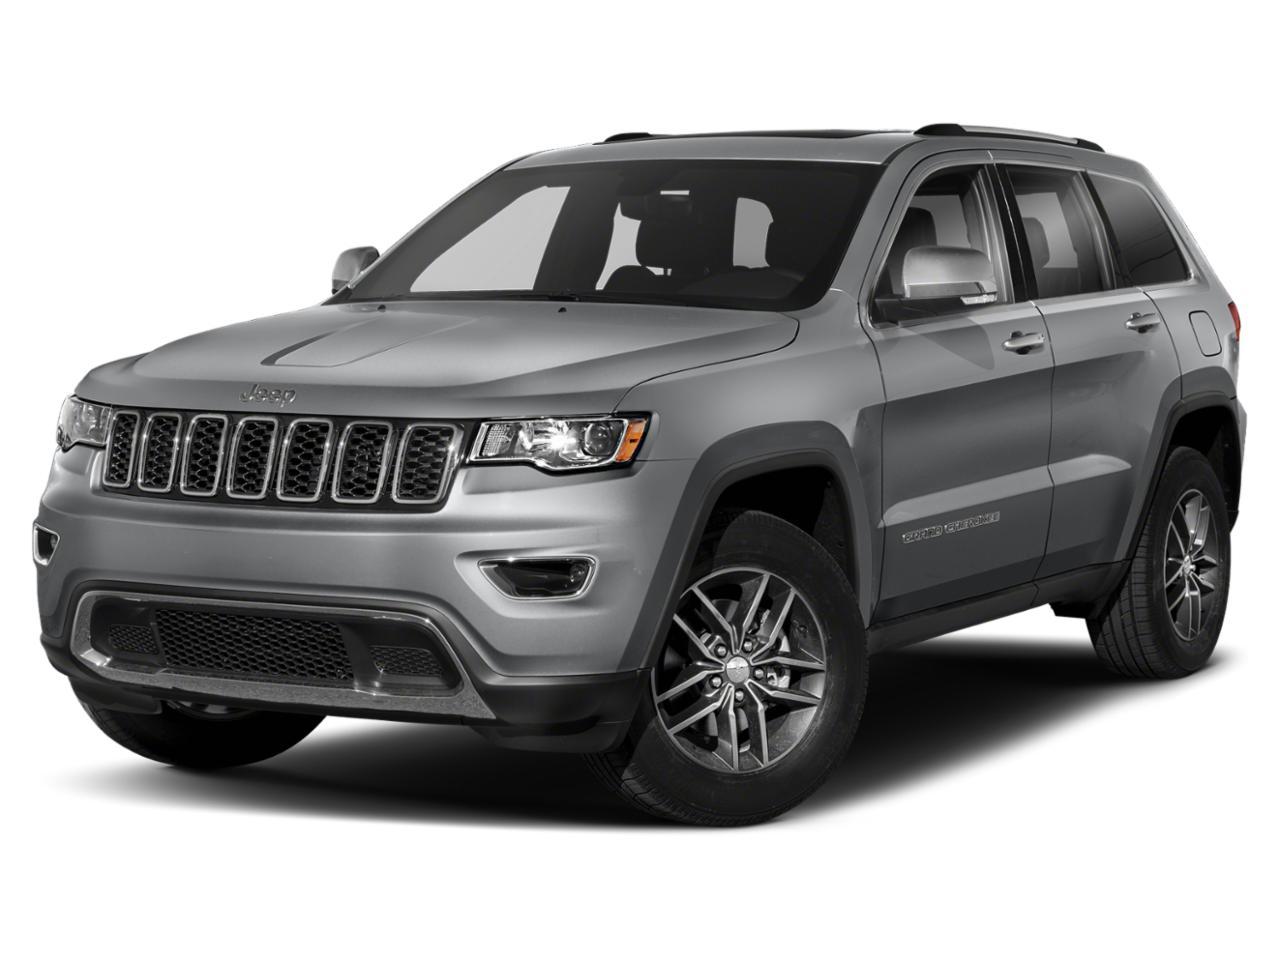 2020 Jeep Grand Cherokee Vehicle Photo in Concord, NC 28027